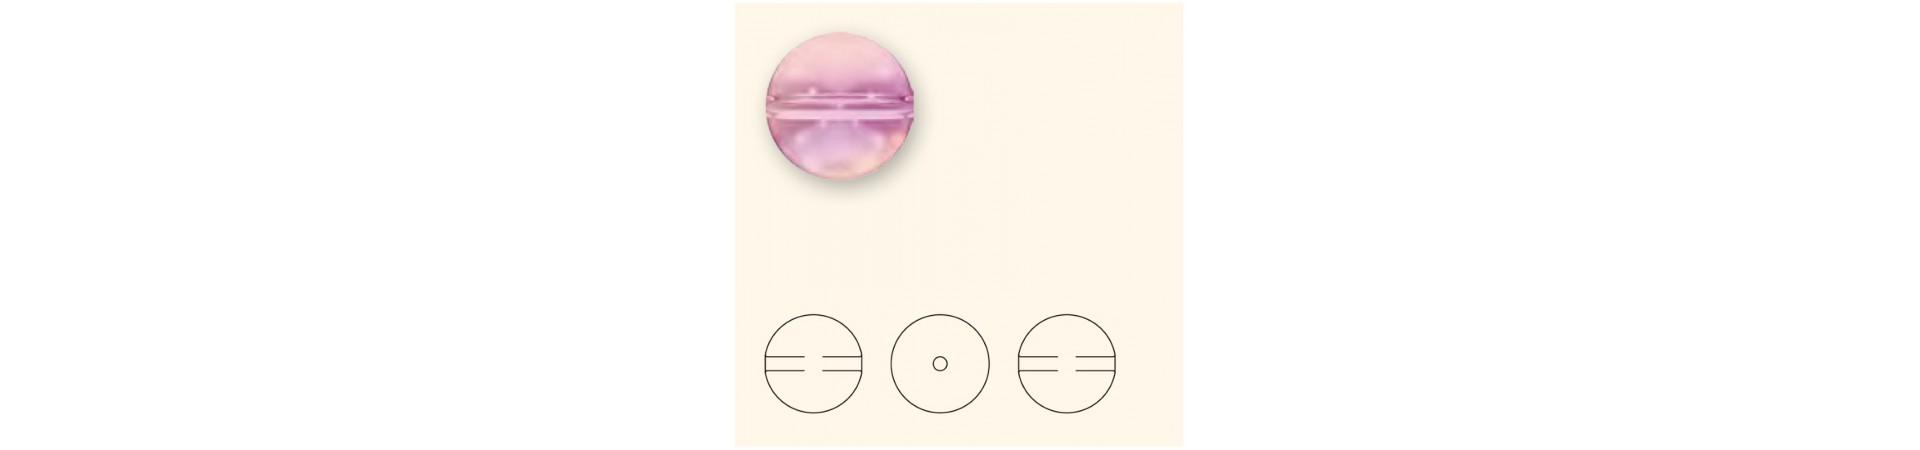 5028/4 Crystal Globe helmed